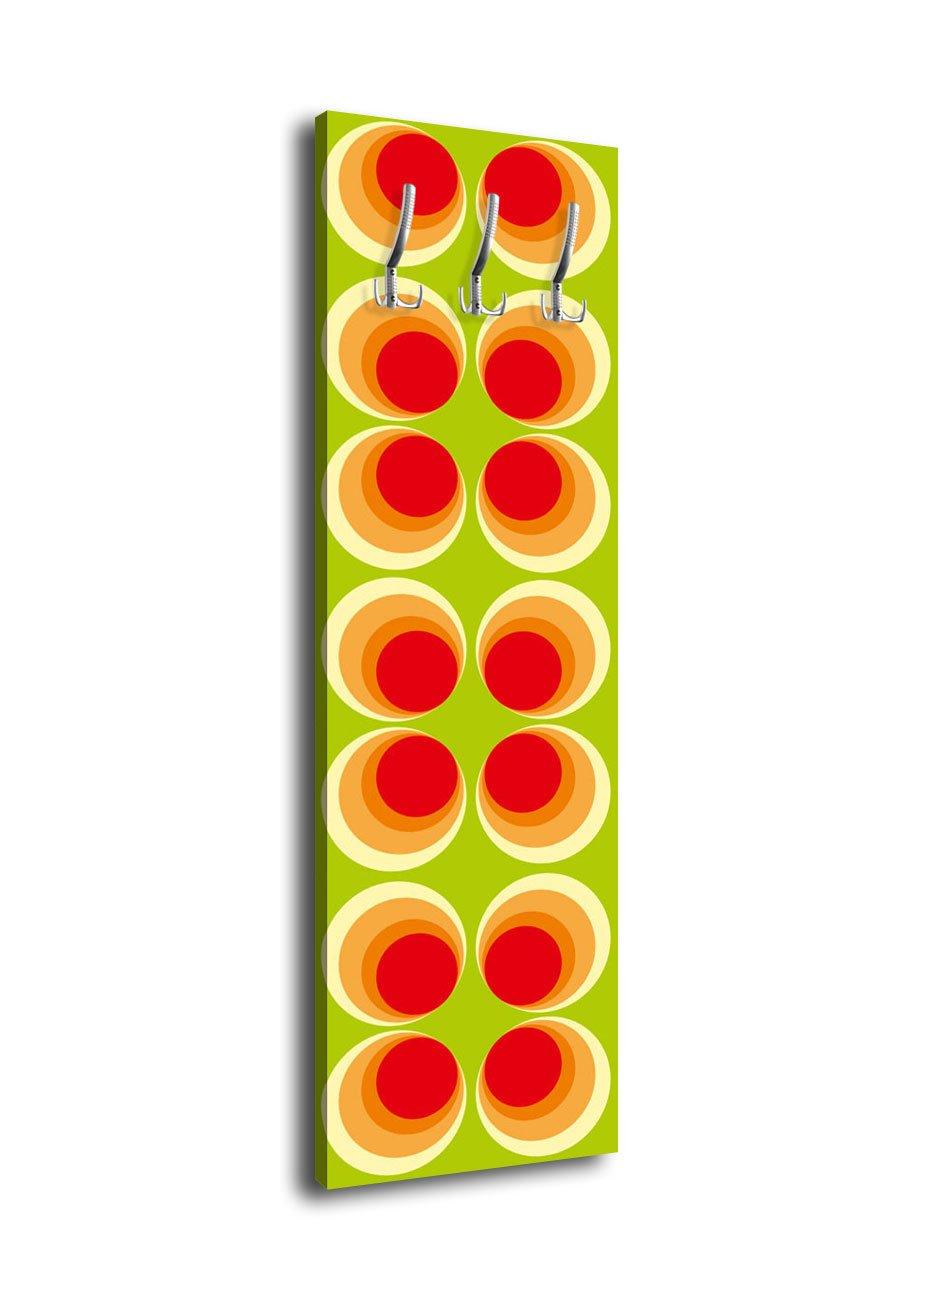 wandmotiv24 Perchero Retro con círculos Naranja G066 40 x ...